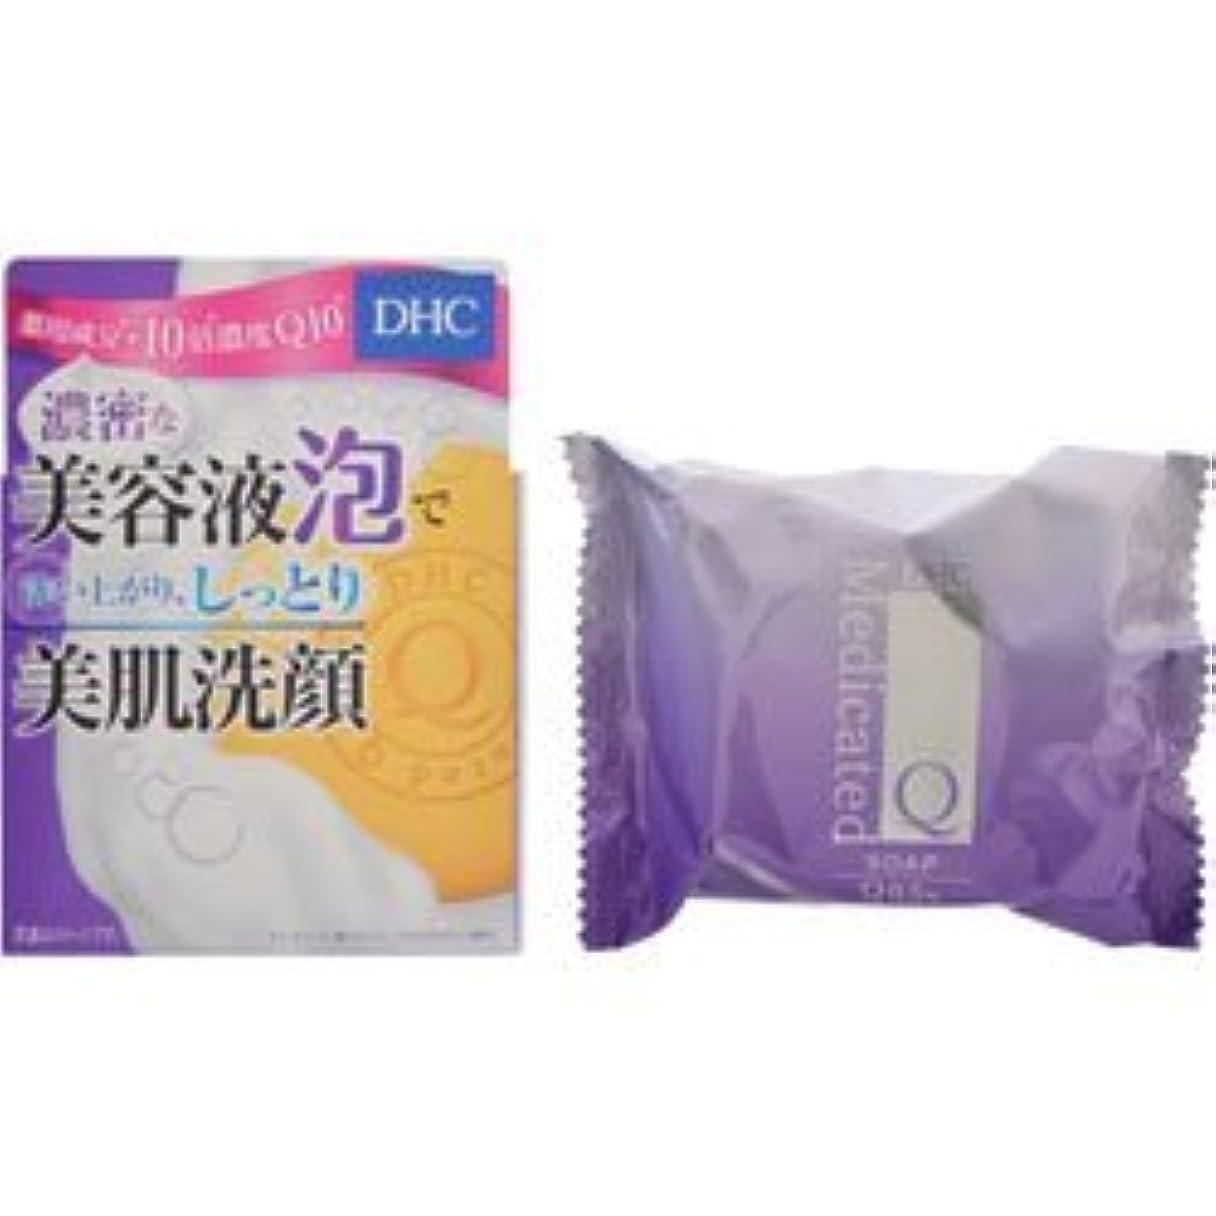 【DHC】DHC 薬用Qソープ SS 60g ×5個セット